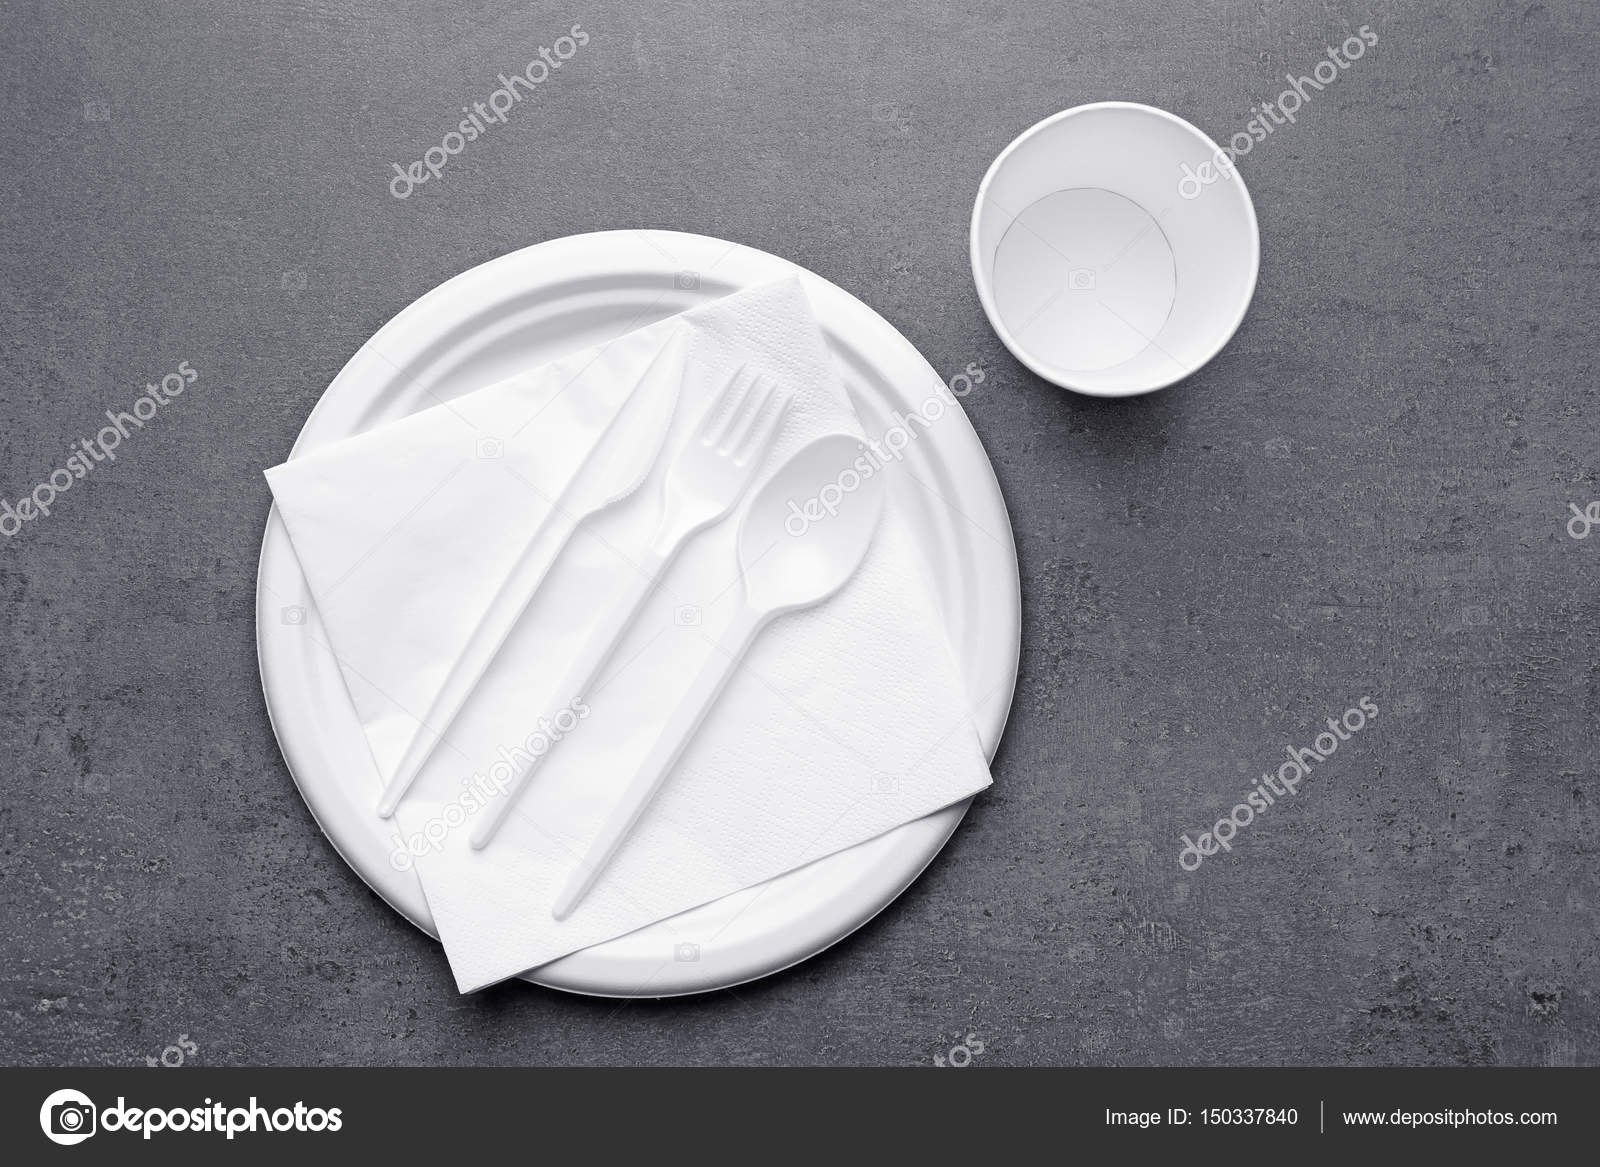 Plastic disposable tableware u2014 Stock Photo & plastic disposable tableware u2014 Stock Photo © belchonock #150337840